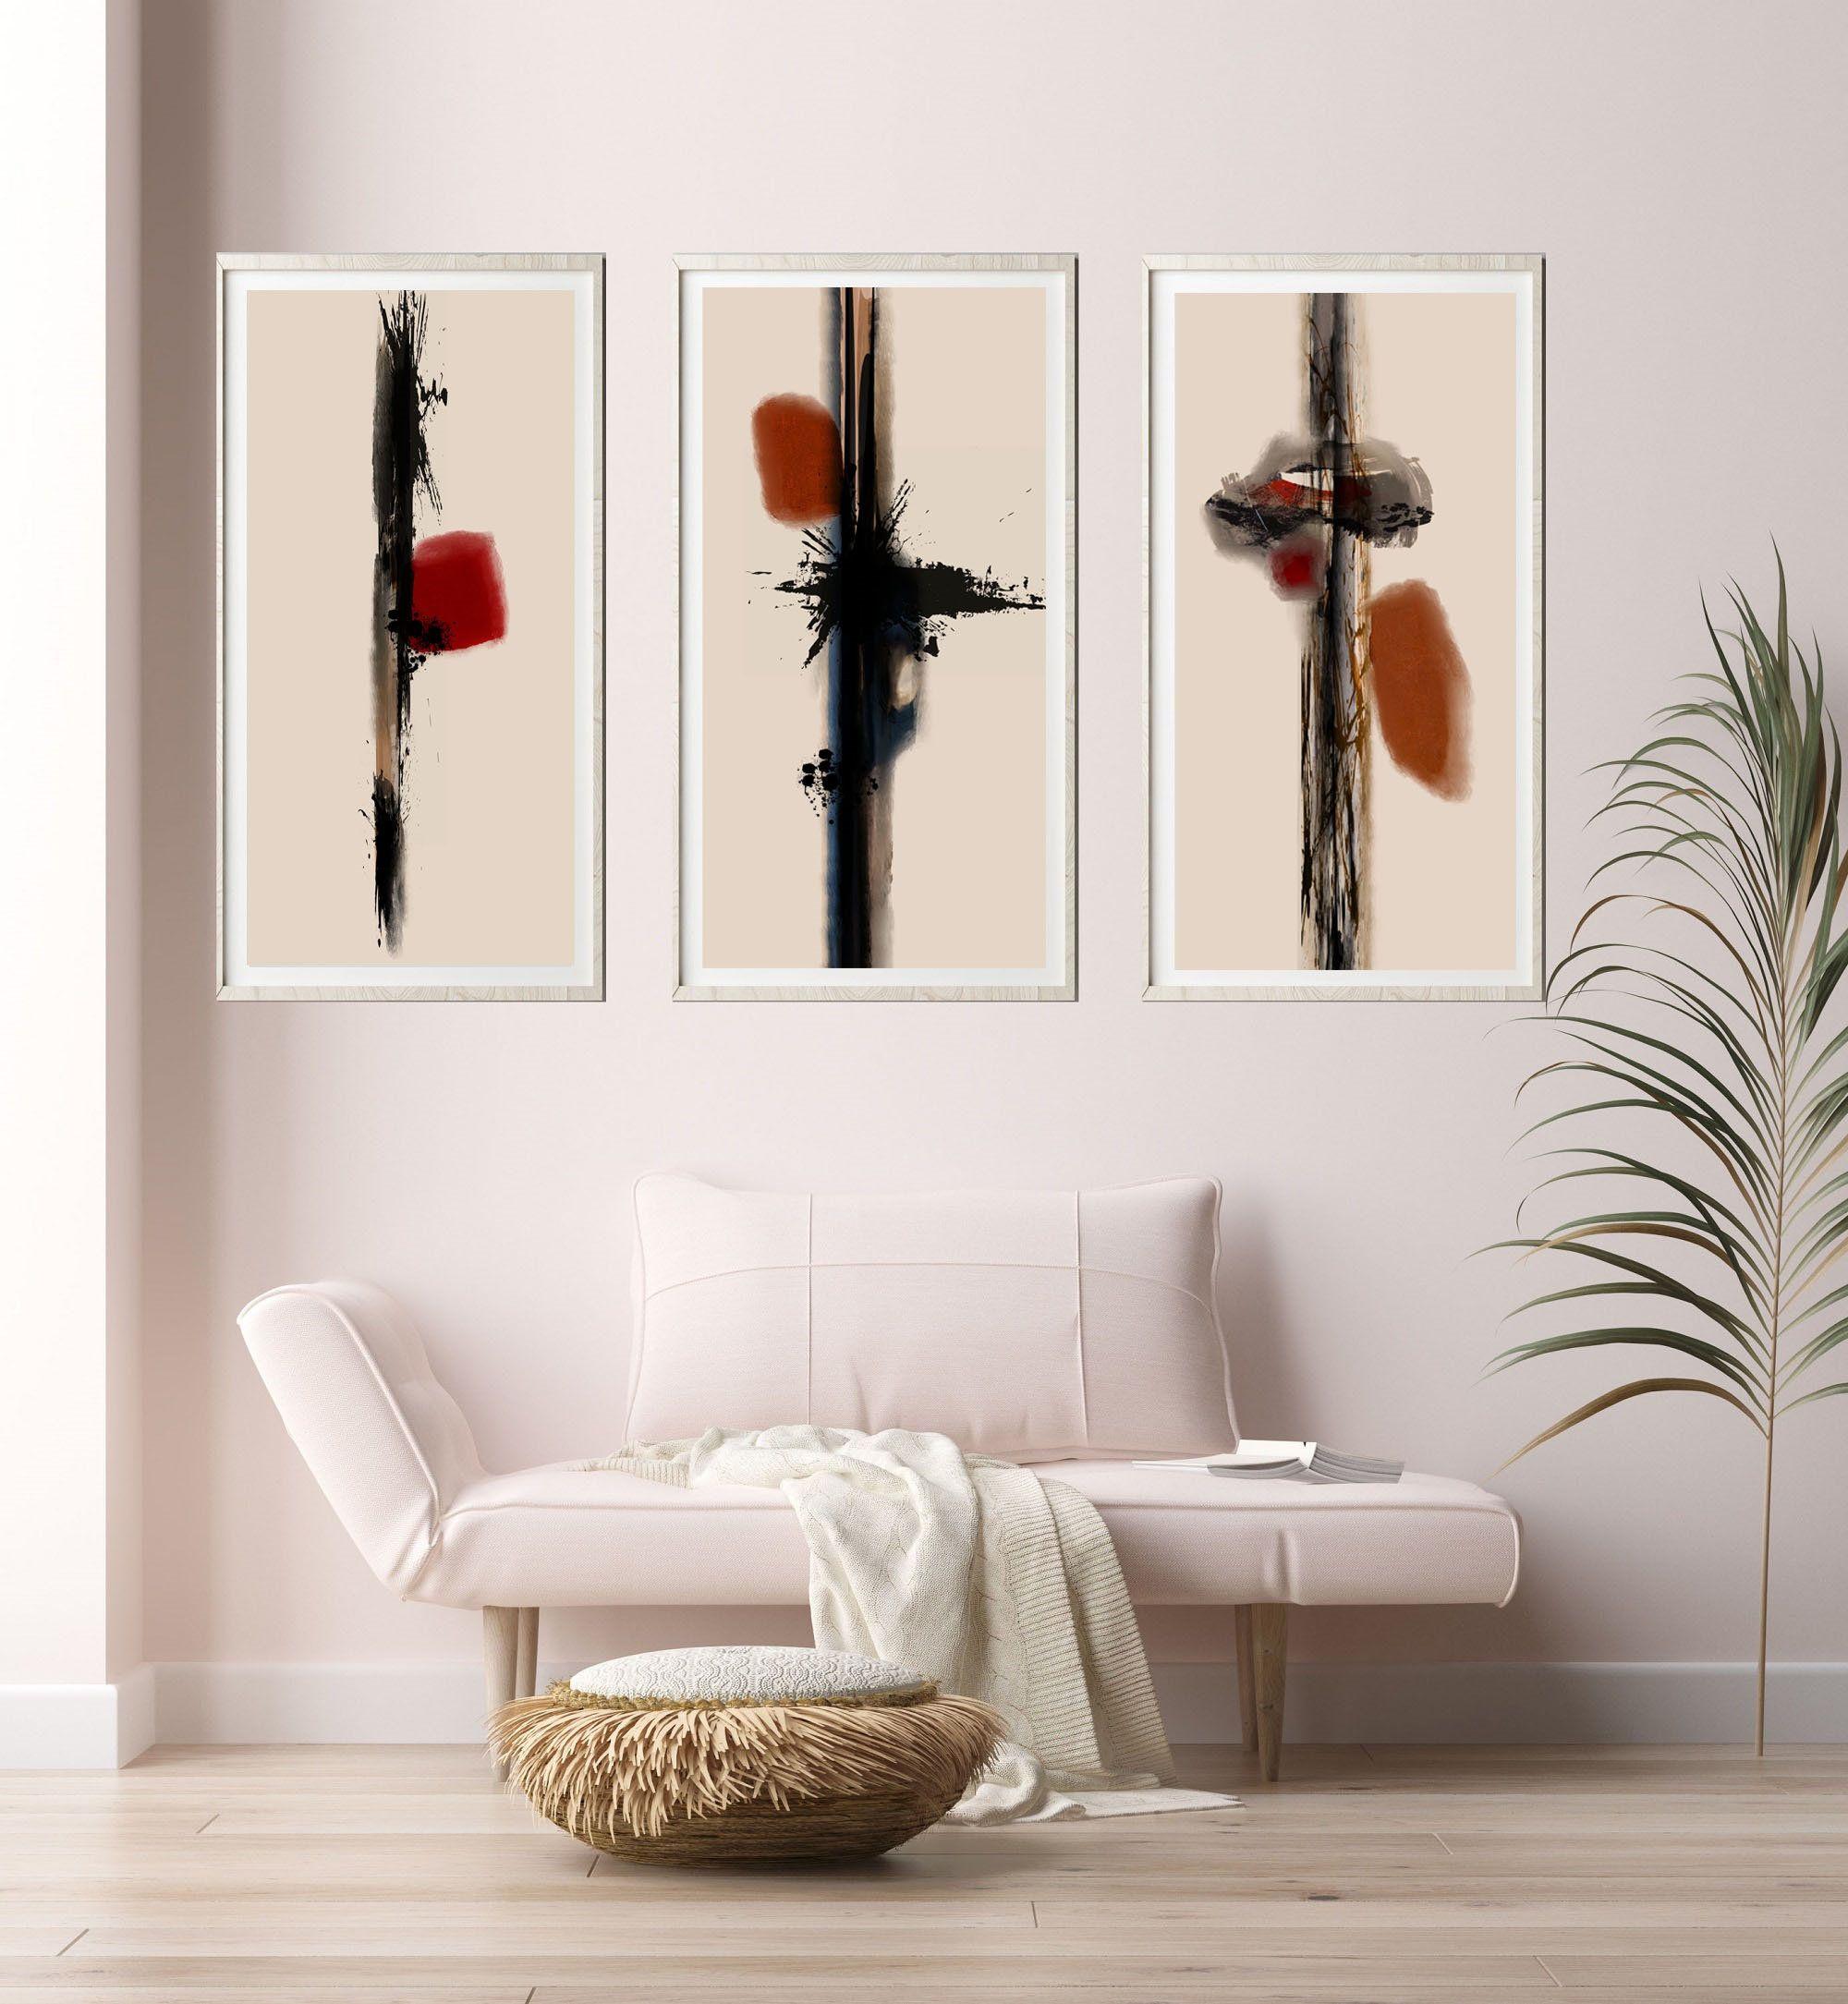 Minimalist Japanese Style Abstract Set Of 3 Prints Modern Etsy In 2021 Japanese Art Modern Minimalist Modern Art Minimalist Prints